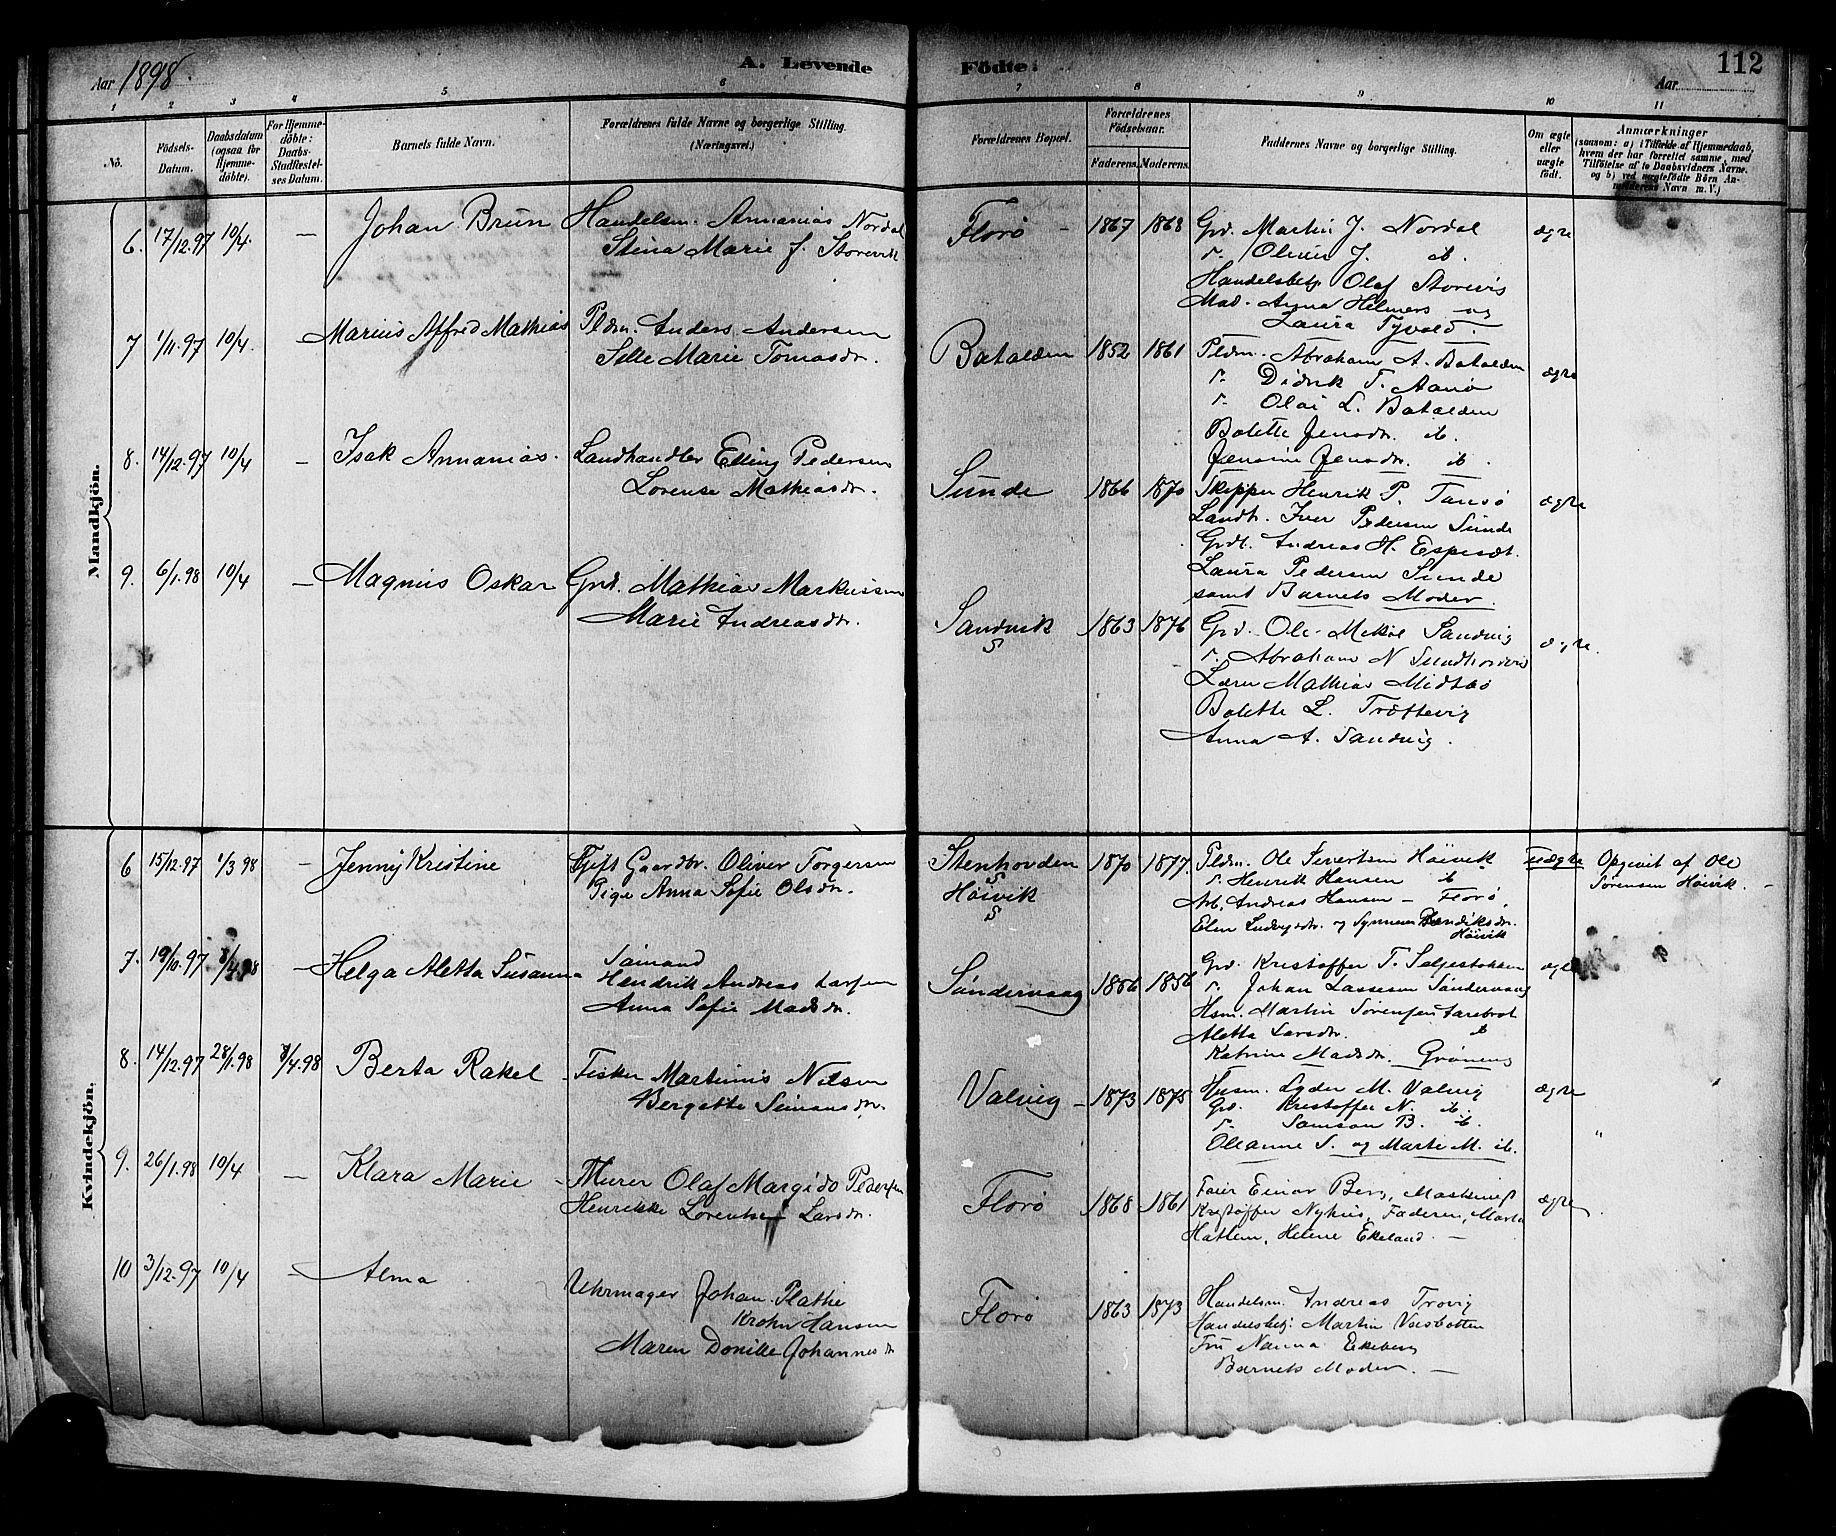 SAB, Kinn Sokneprestembete, Parish register (copy) no. A 2, 1882-1906, p. 112